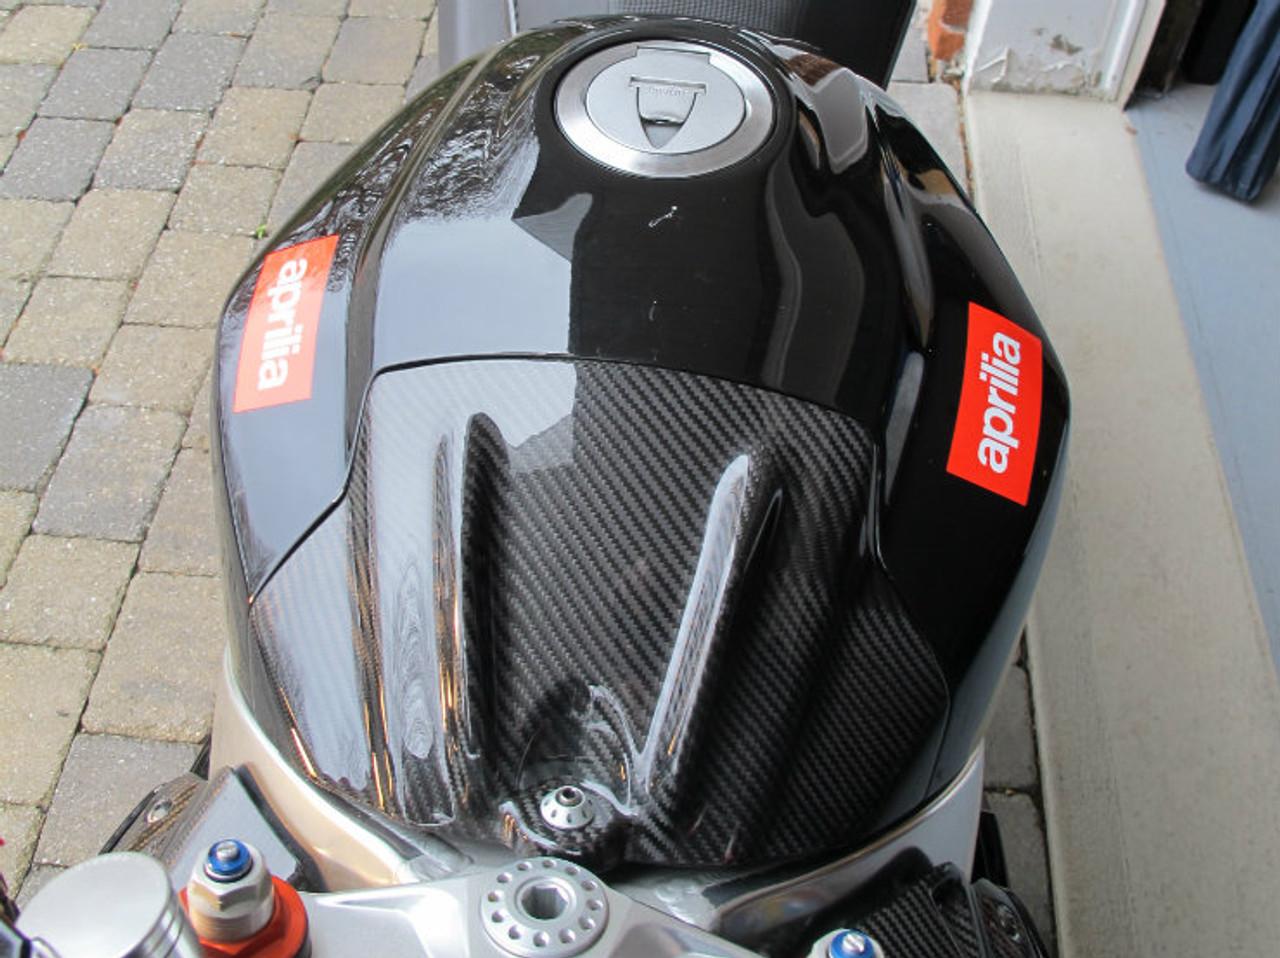 Glossy Twill Weave  Carbon Fiber Tank Front Cover for Aprilia RSV4 09-12, Tuono V4 11-13 installed